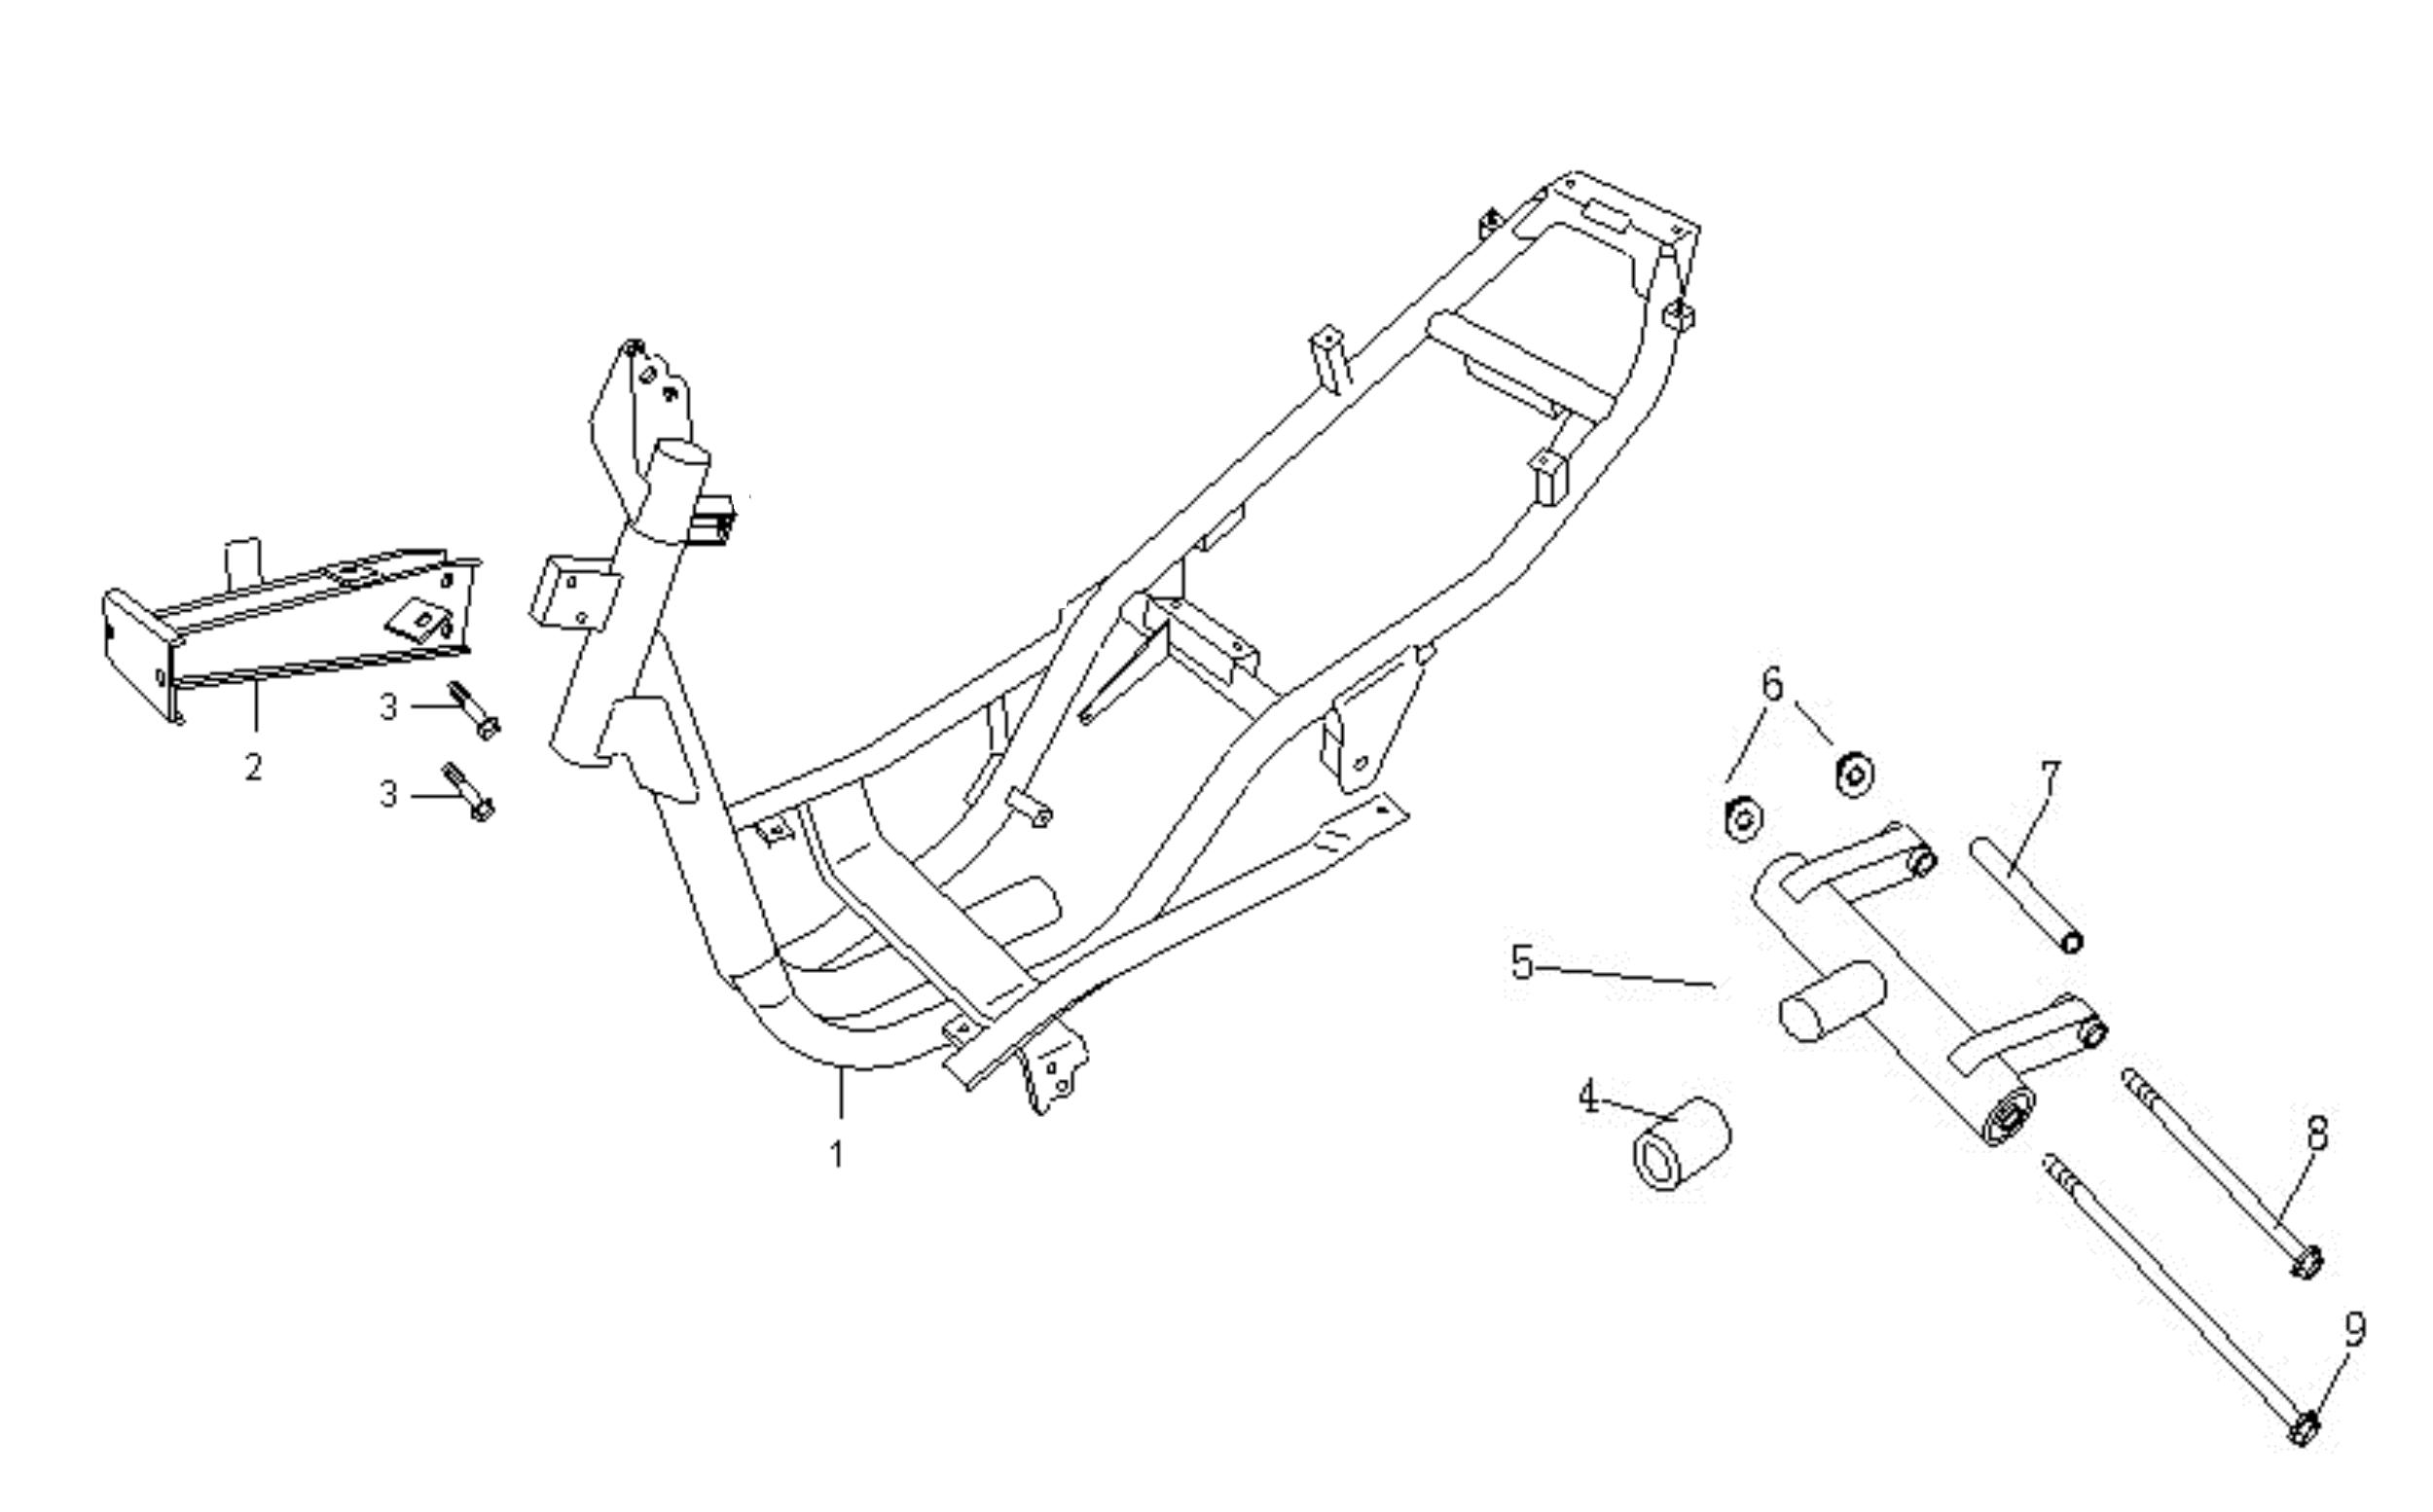 Rahmen, Motoraufhängung f. FZG m. 4-Taktmotor